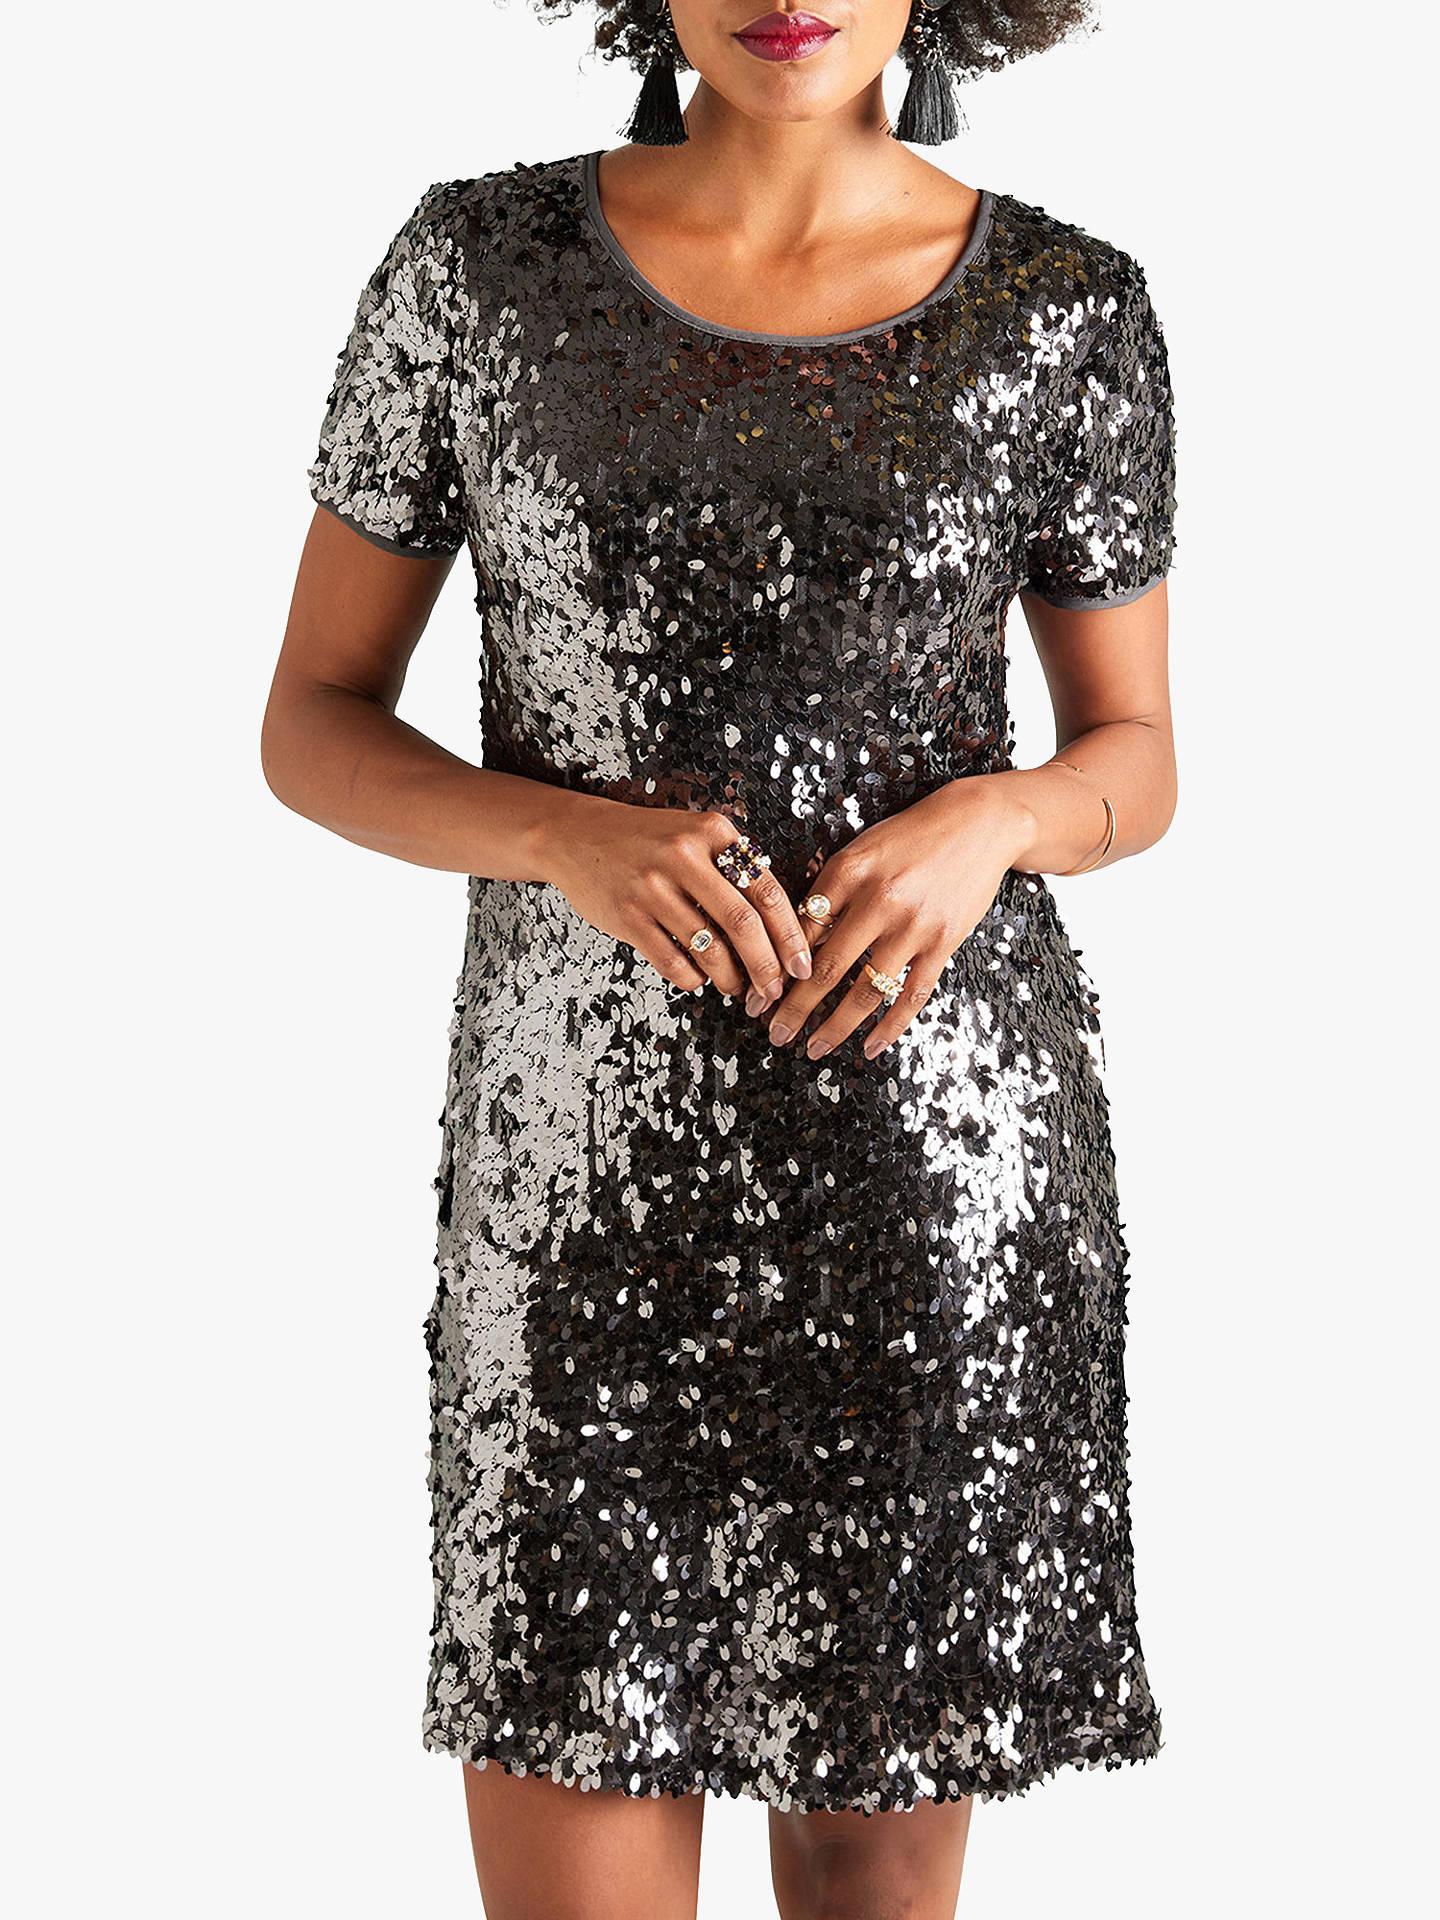 fbb2cecc25 Buy Yumi Sequin Tunic Dress, Grey, 8 Online at johnlewis.com ...